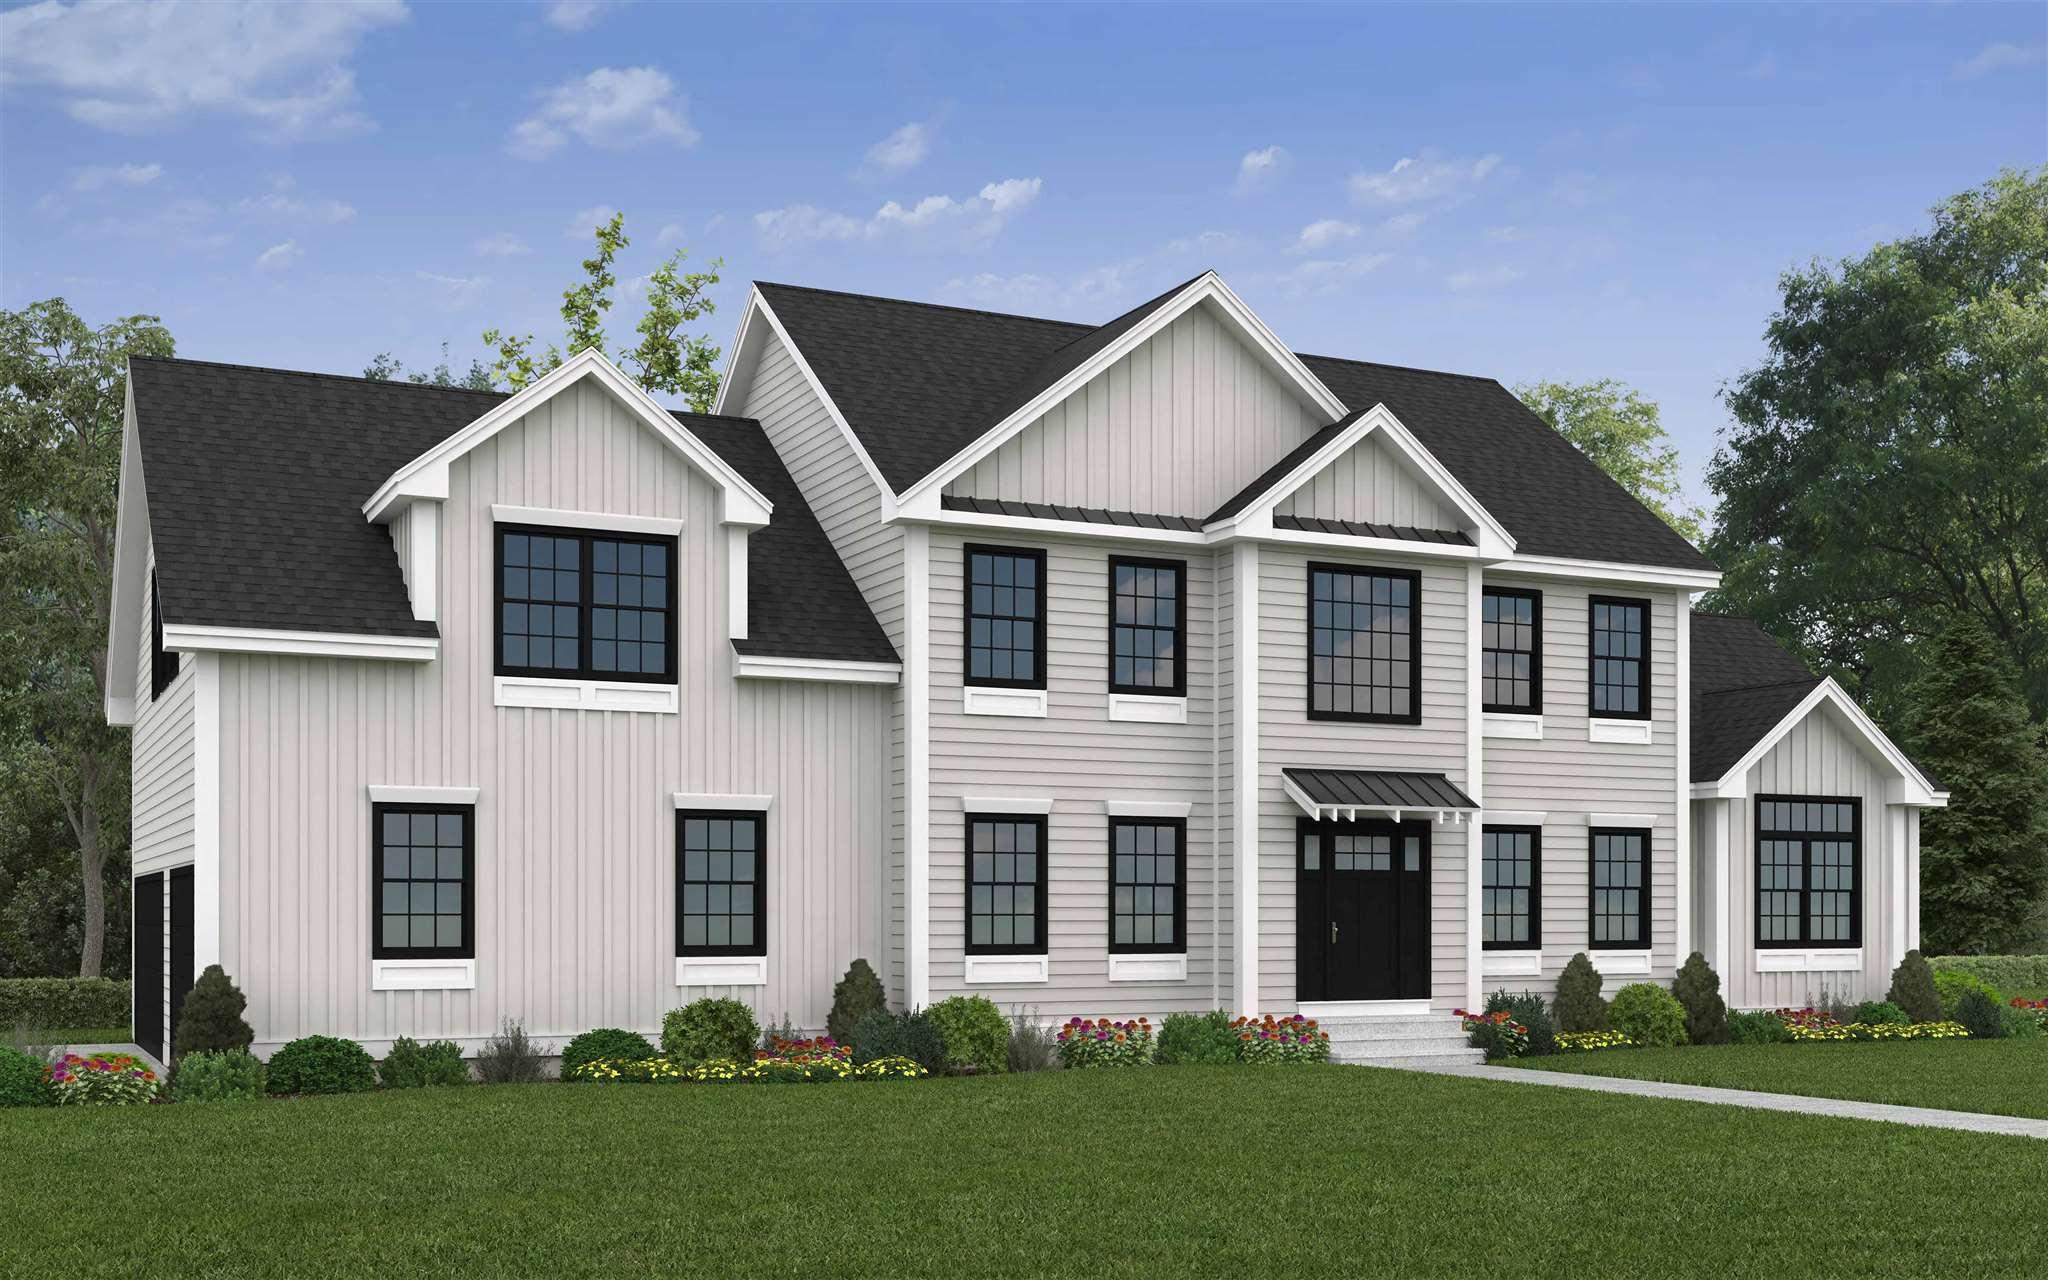 27 Caymus Ridge, Salem, NH 03079